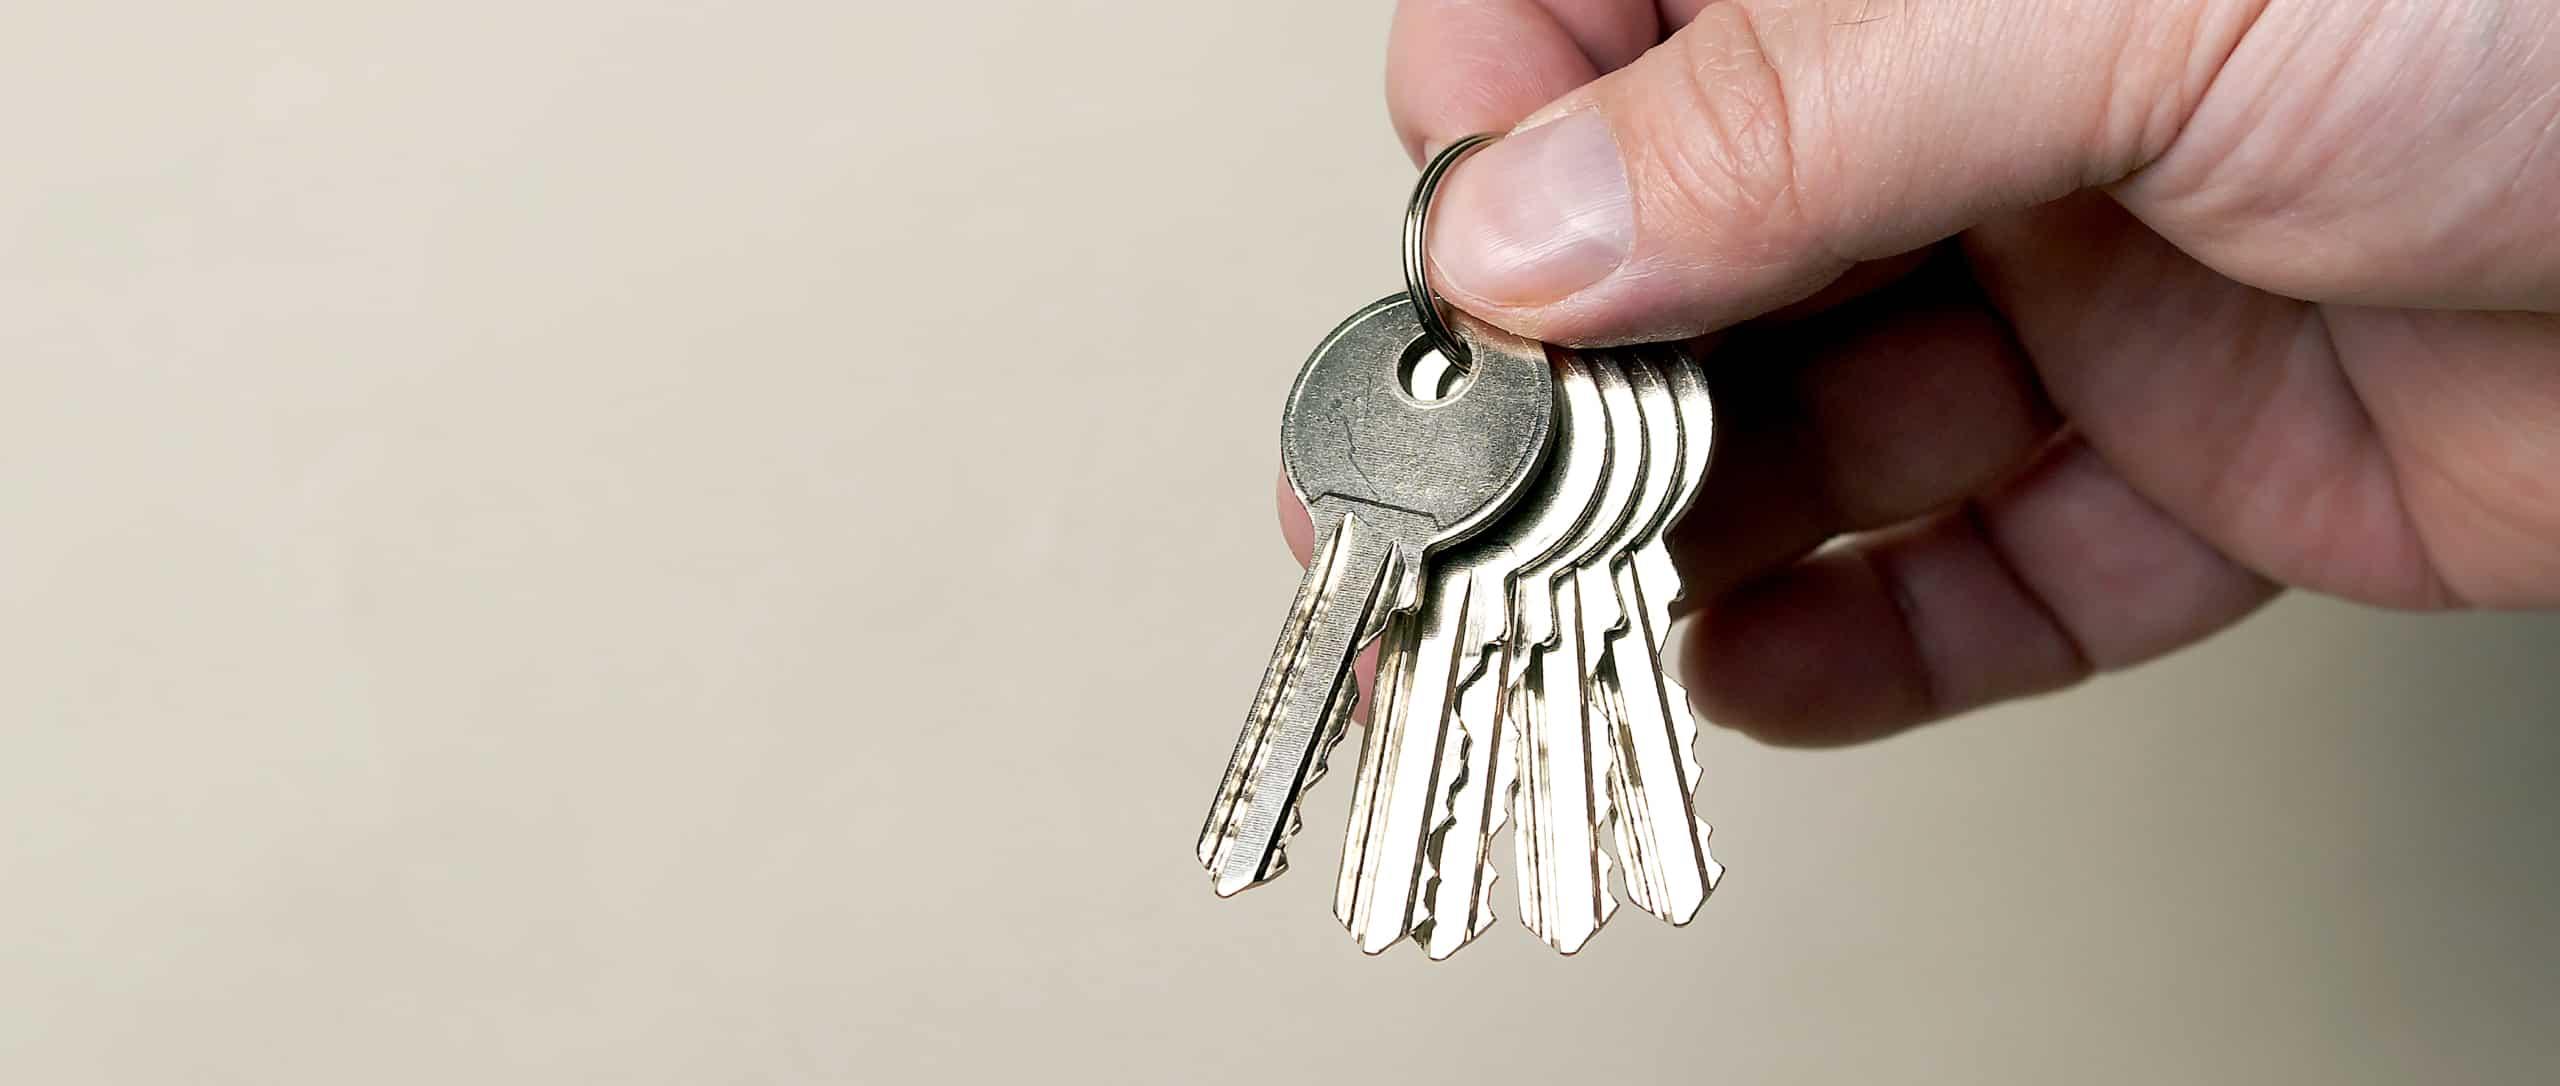 Benefits of a Master Key System Holding Keys